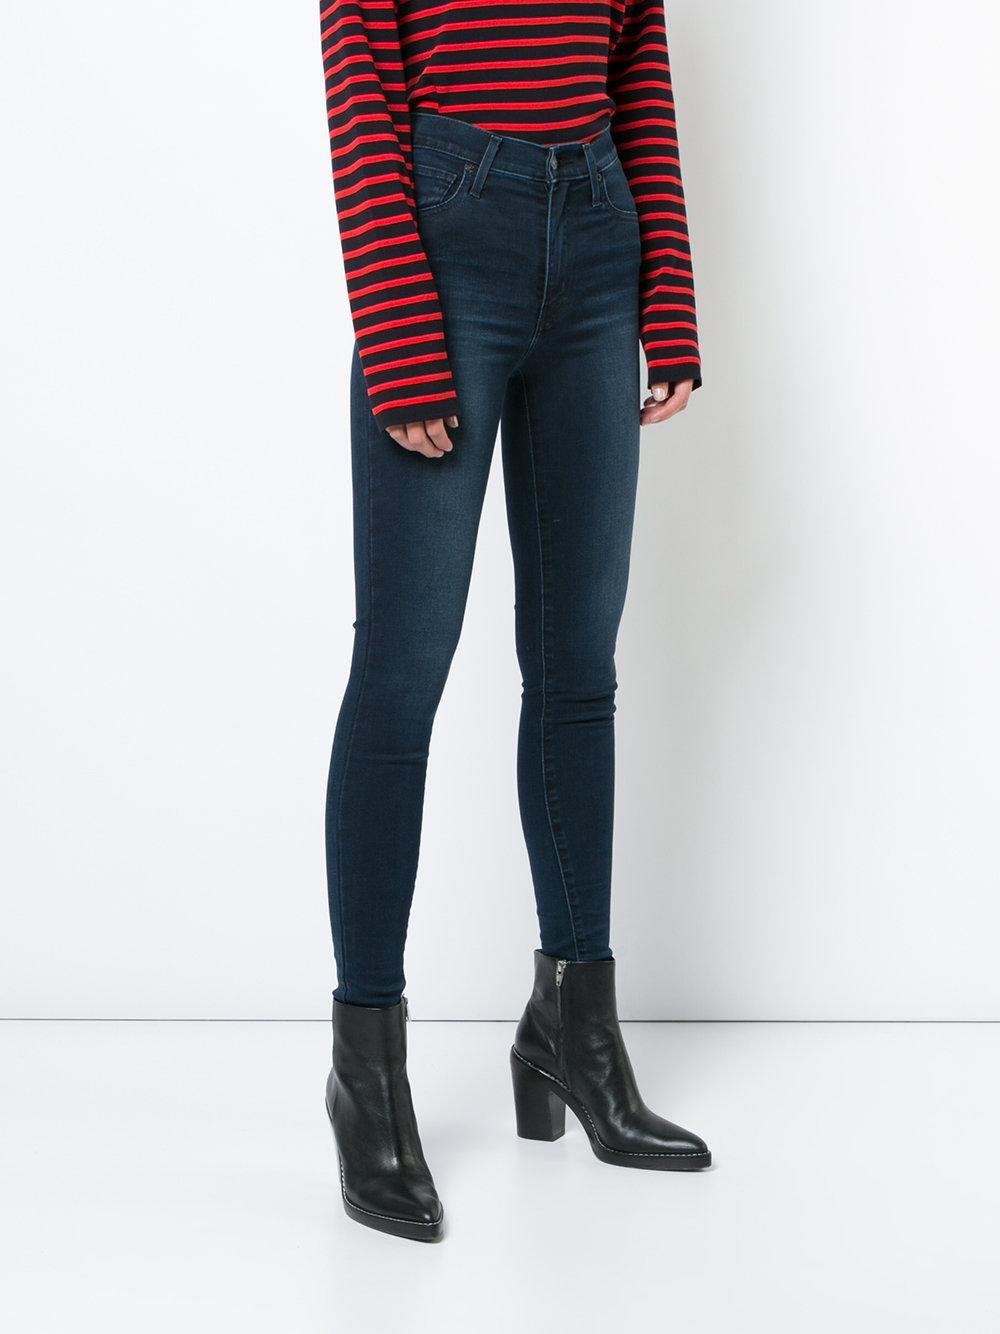 Levi's Denim Super Skinny Jeans in Blue